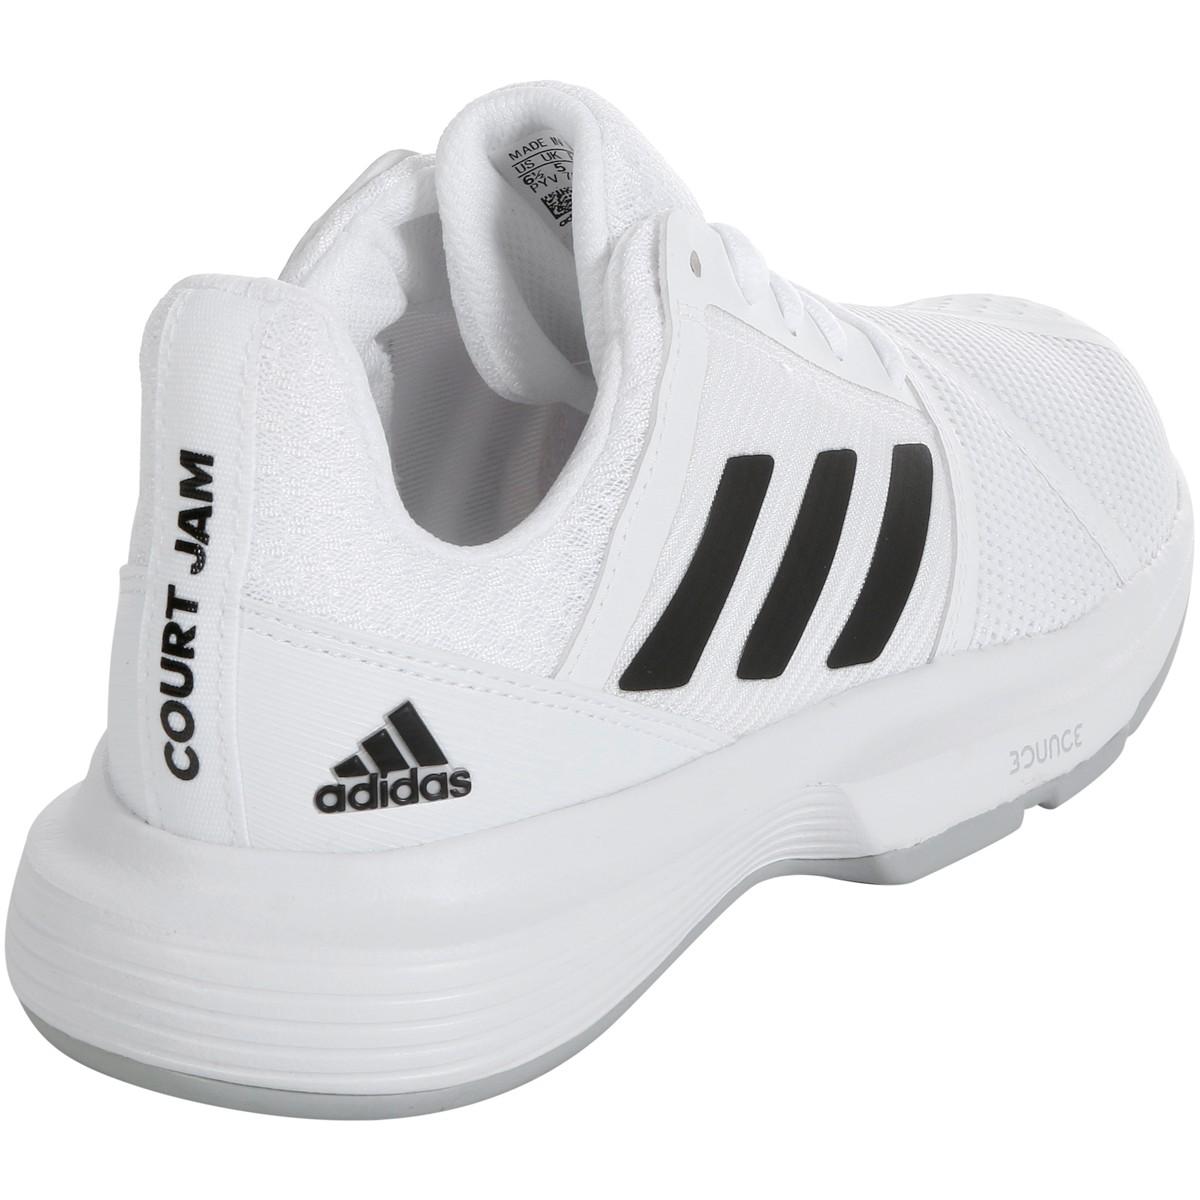 adidas donne des chaussures